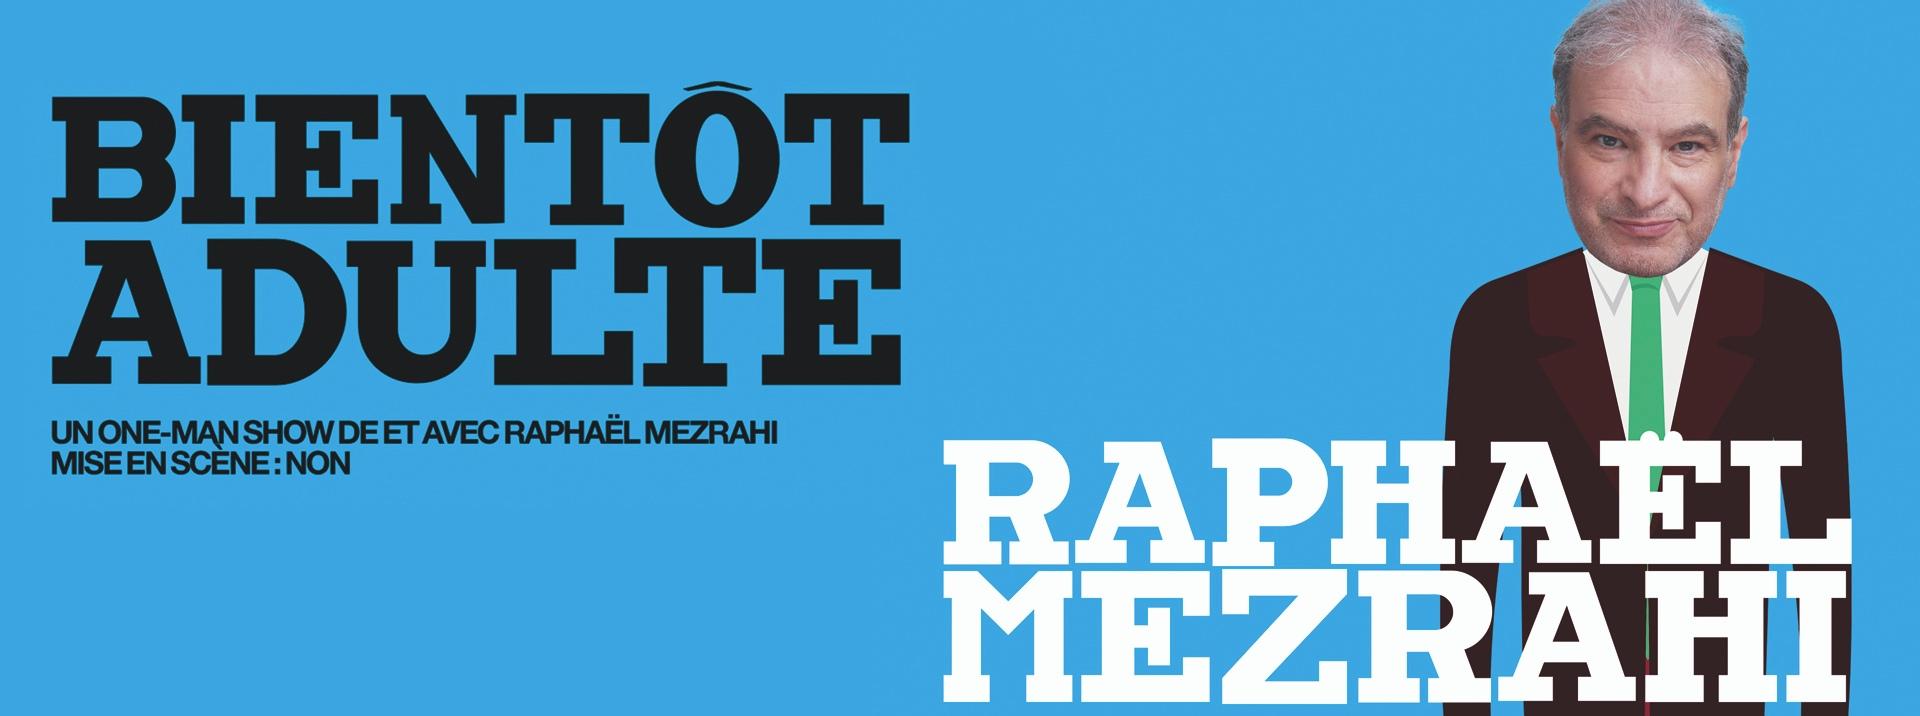 Agenda culturel Nantes Rapahel mezrahi nantes spectacles